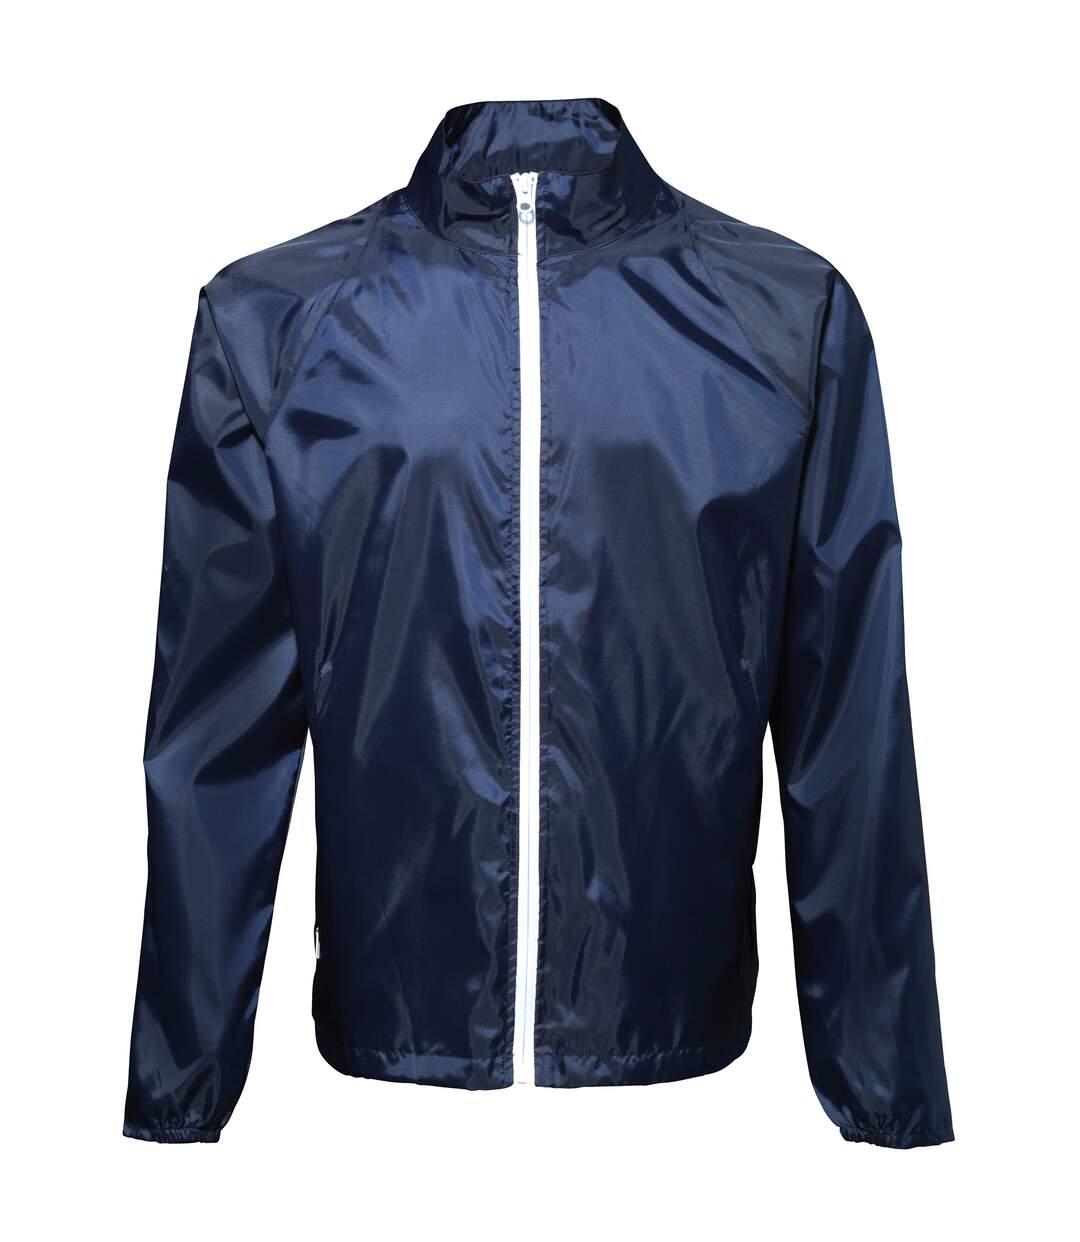 2786 Mens Contrast Lightweight Windcheater Shower Proof Jacket (Sapphire/ White) - UTRW2501